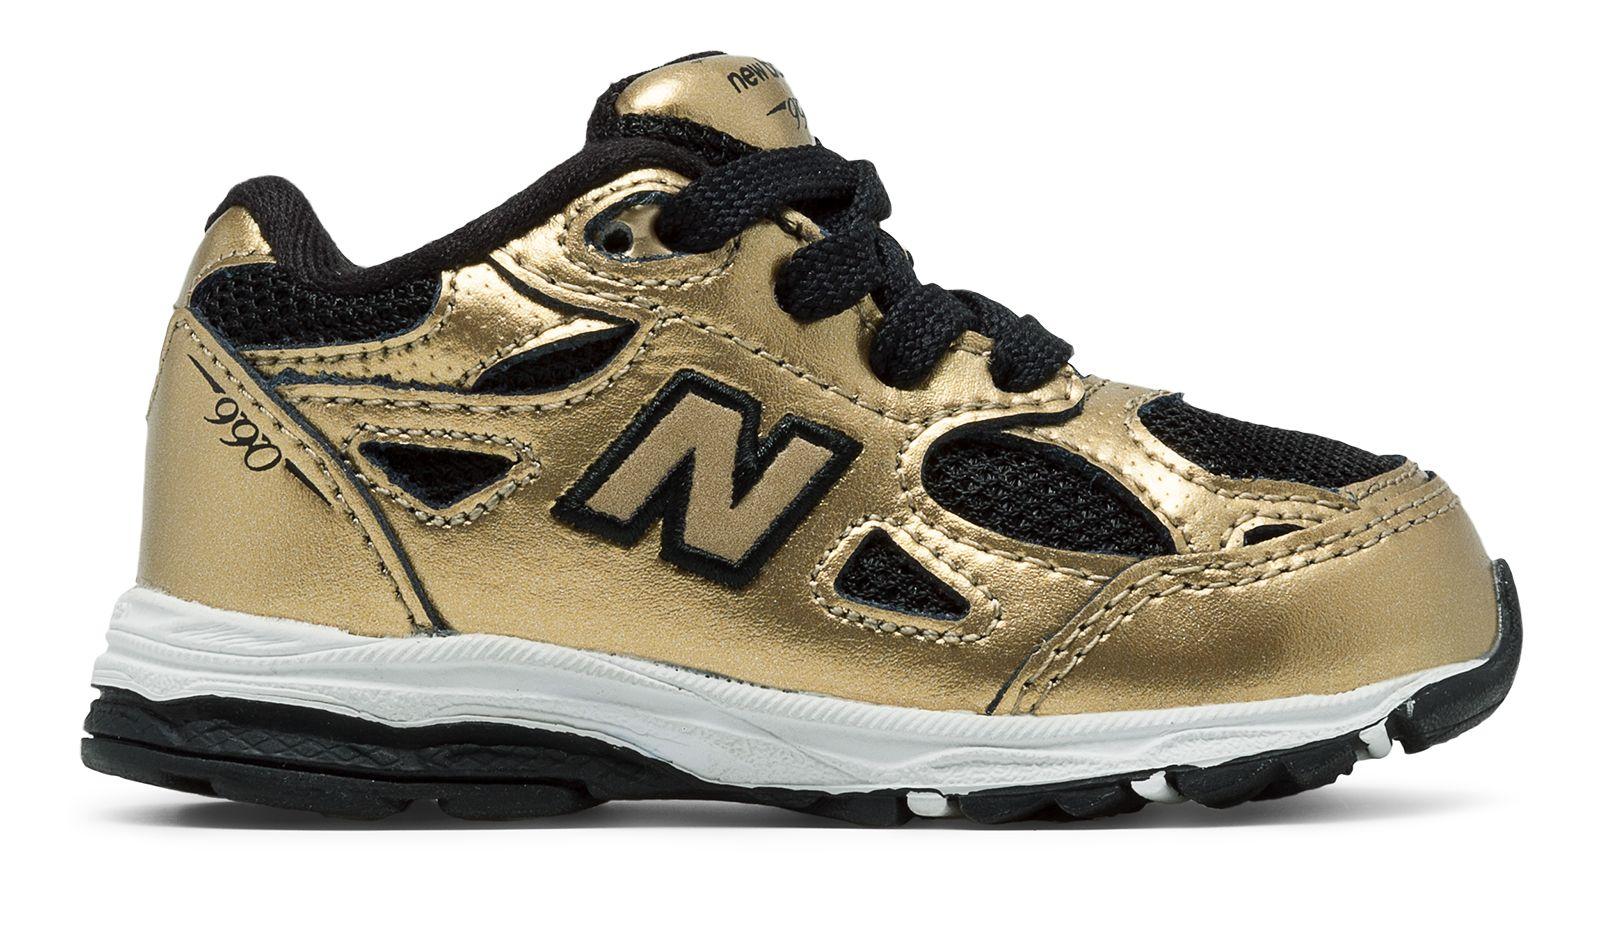 New Balance Kids 990v 3 Shoes Gold